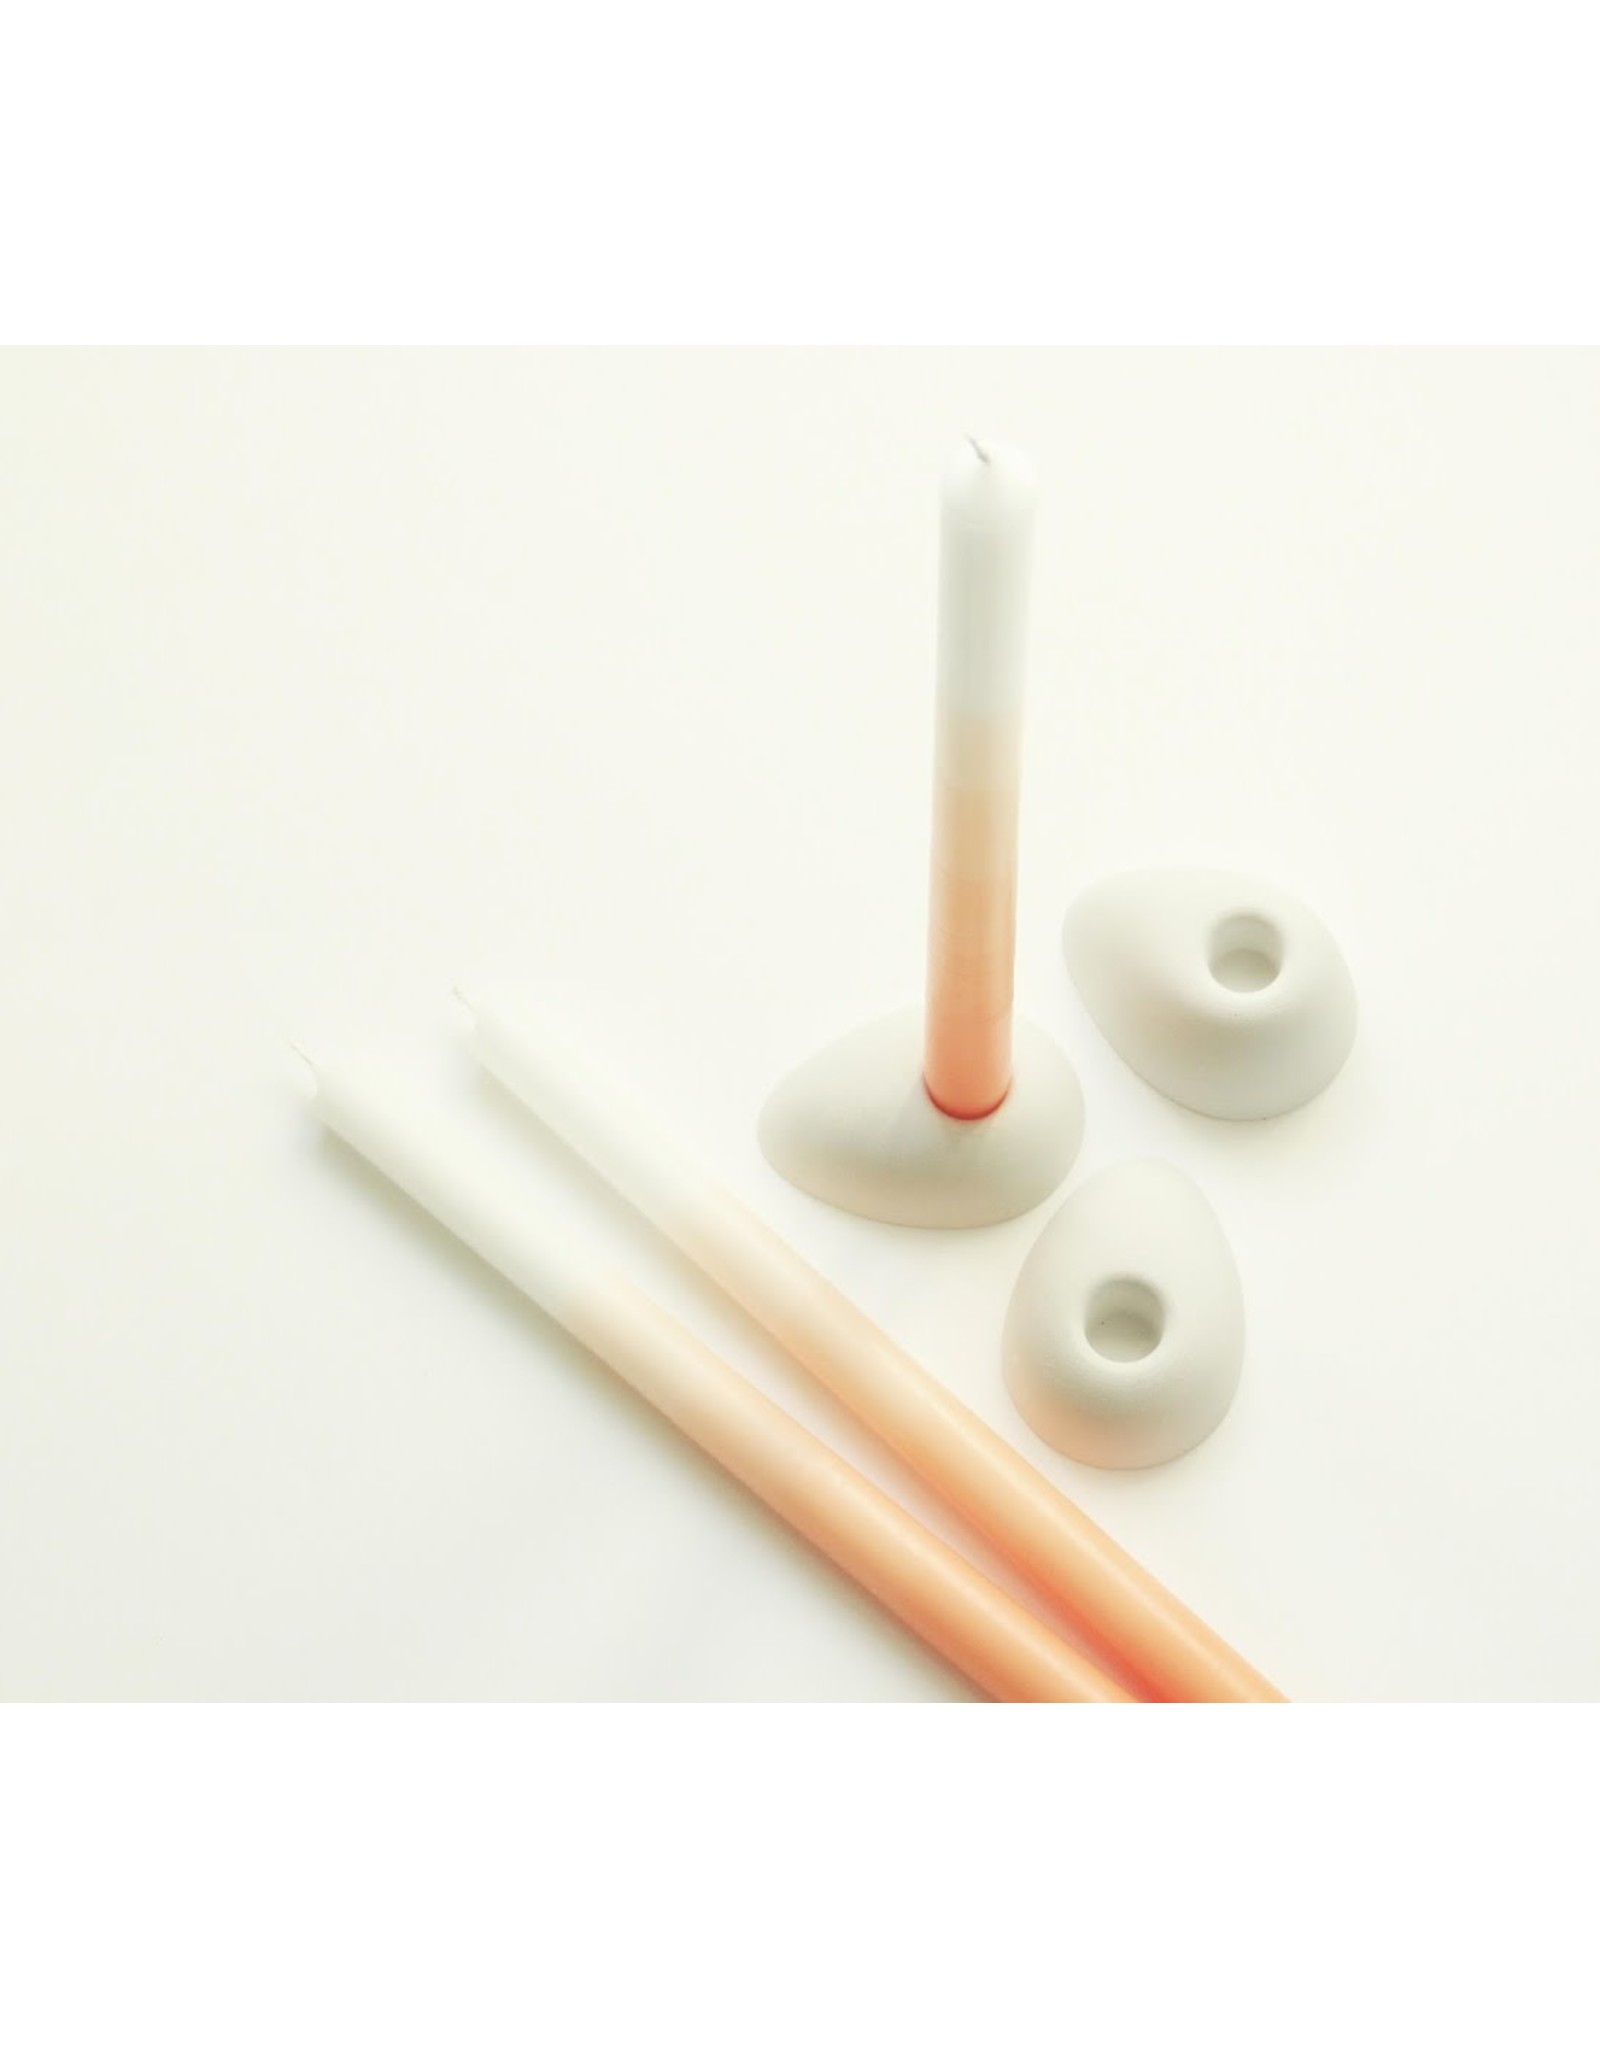 Mo Man Tai Gradient Candle (per piece) Dutch Orange